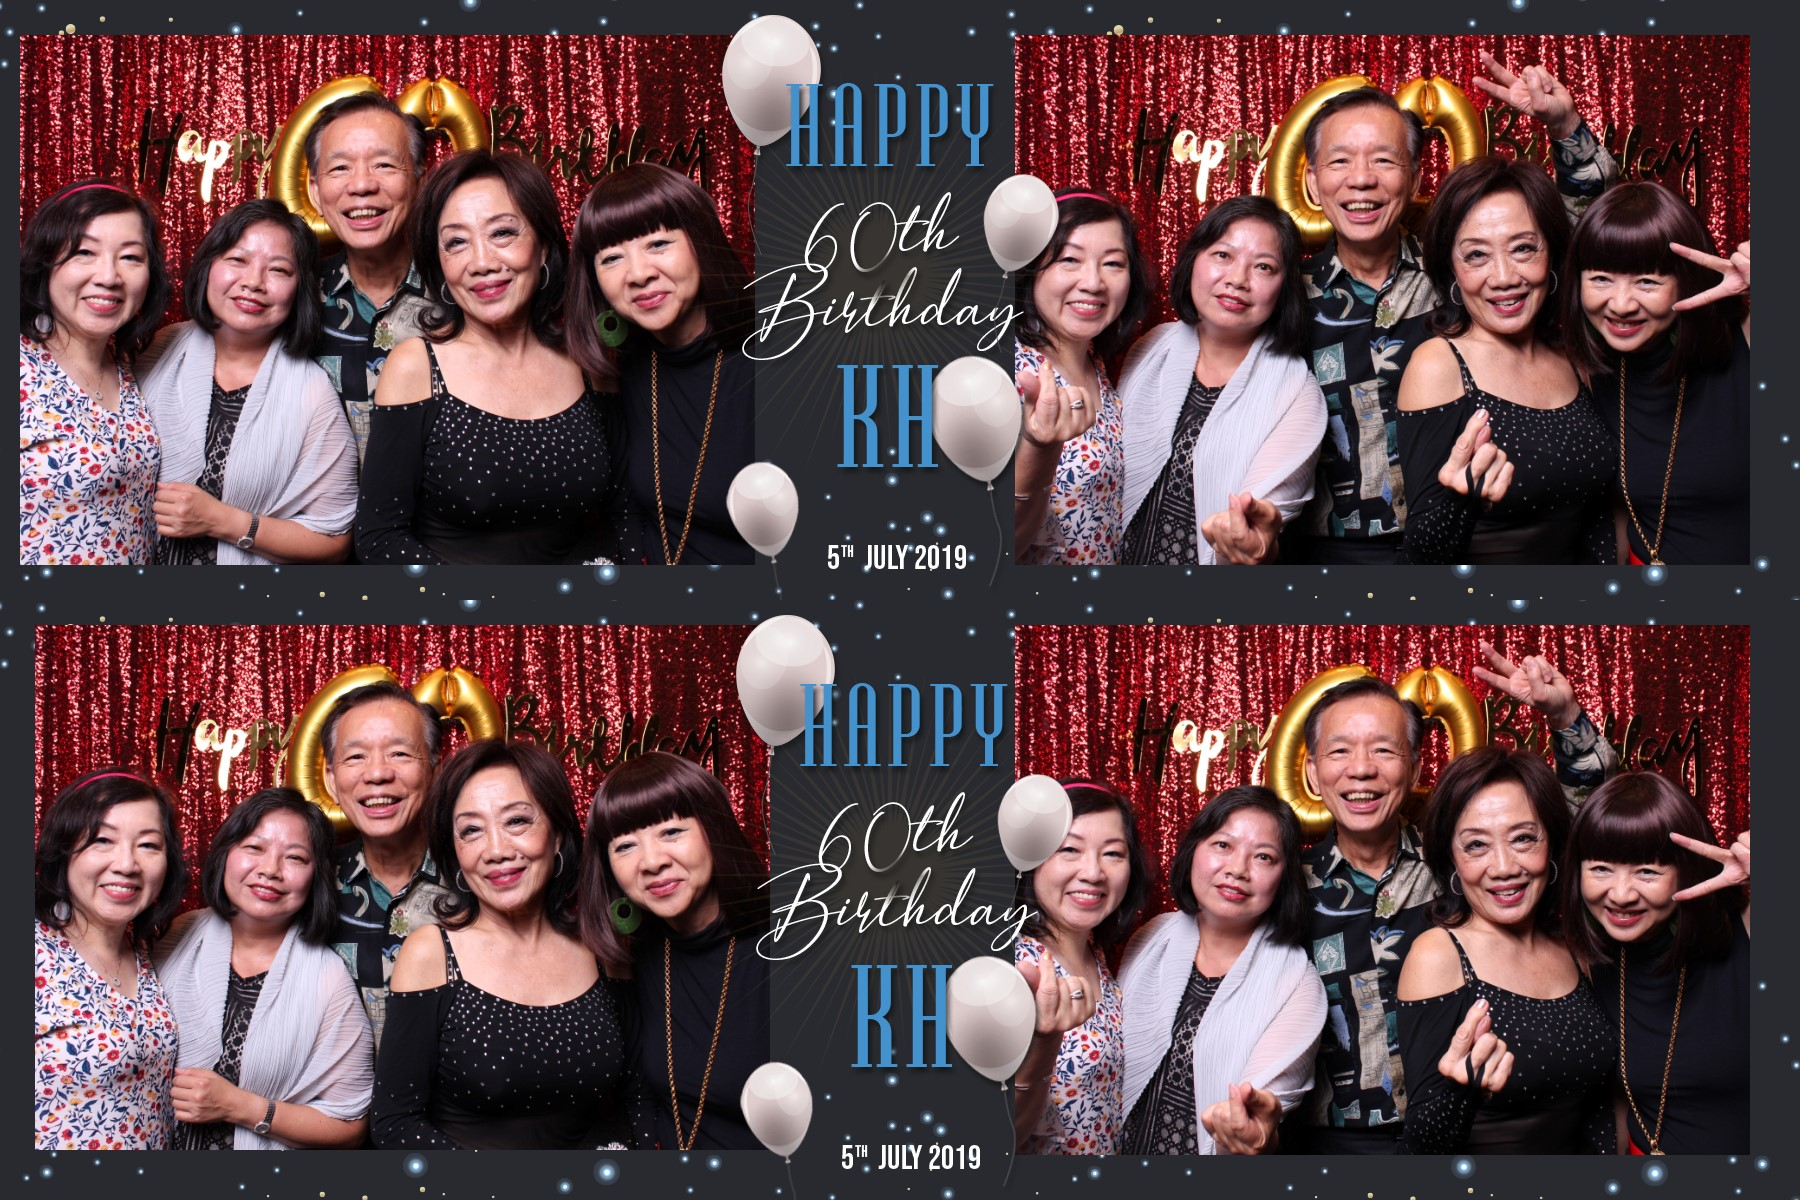 KH Birthday Party 2R Horizontal Copper Mansion PJ